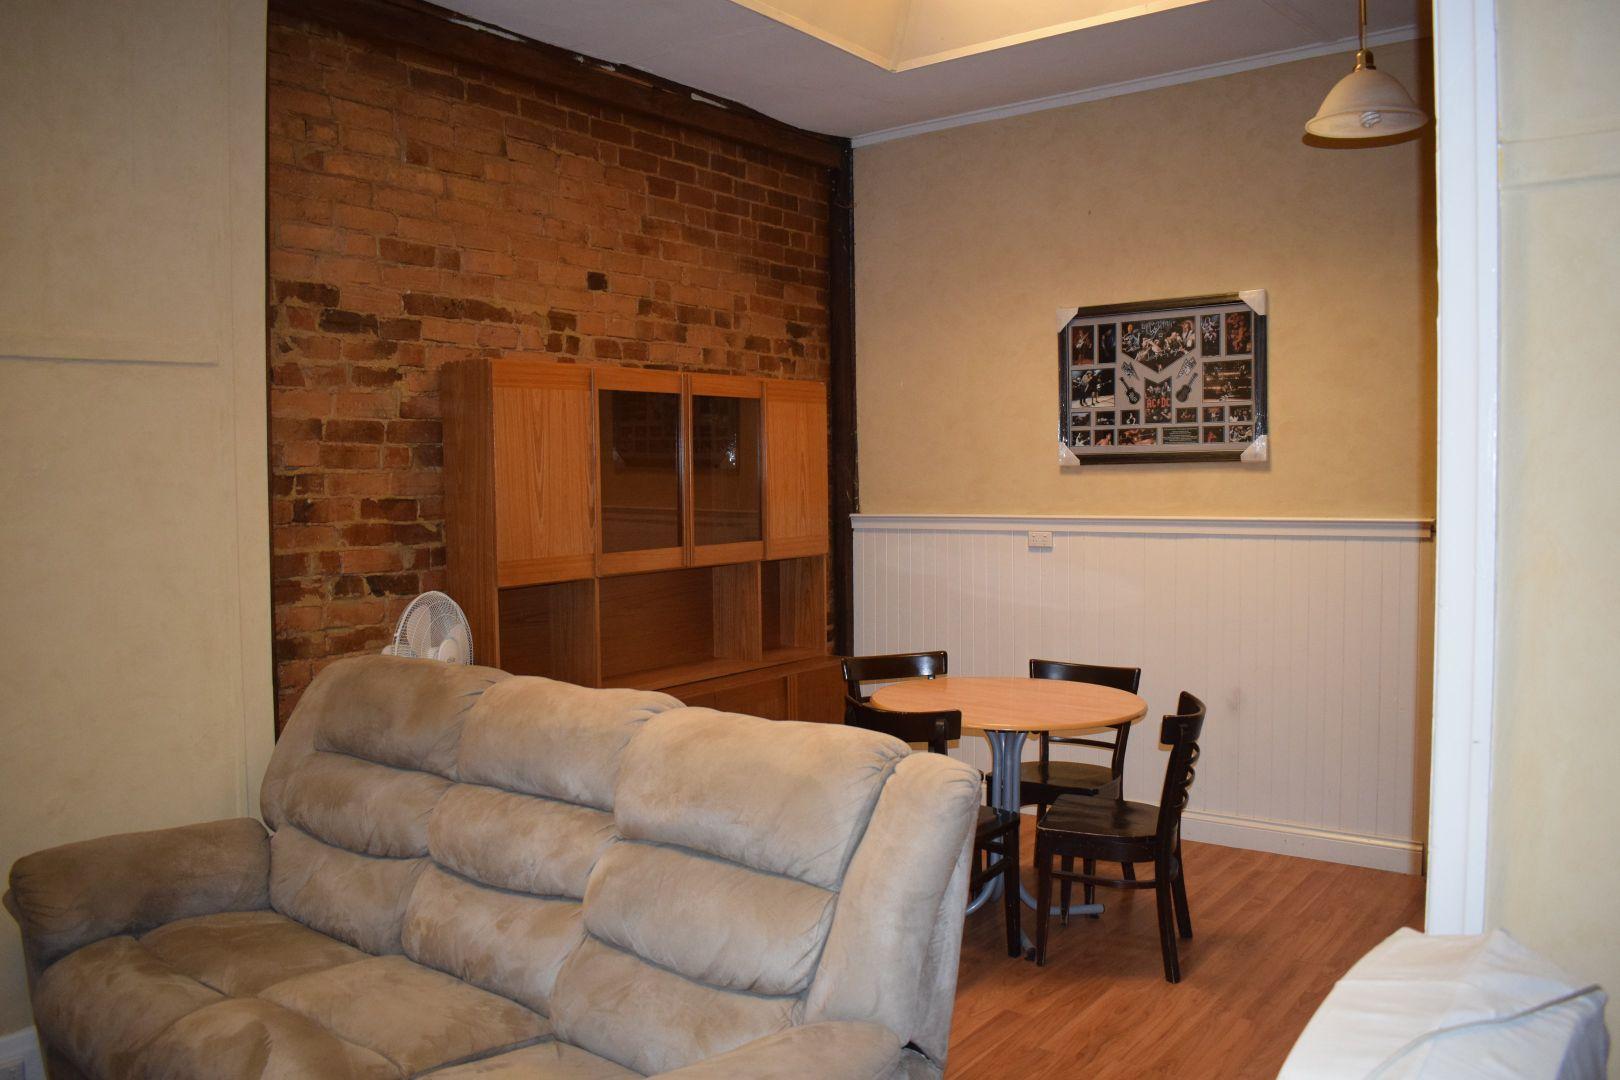 46-48 Brooke Street, Inglewood VIC 3517, Image 2